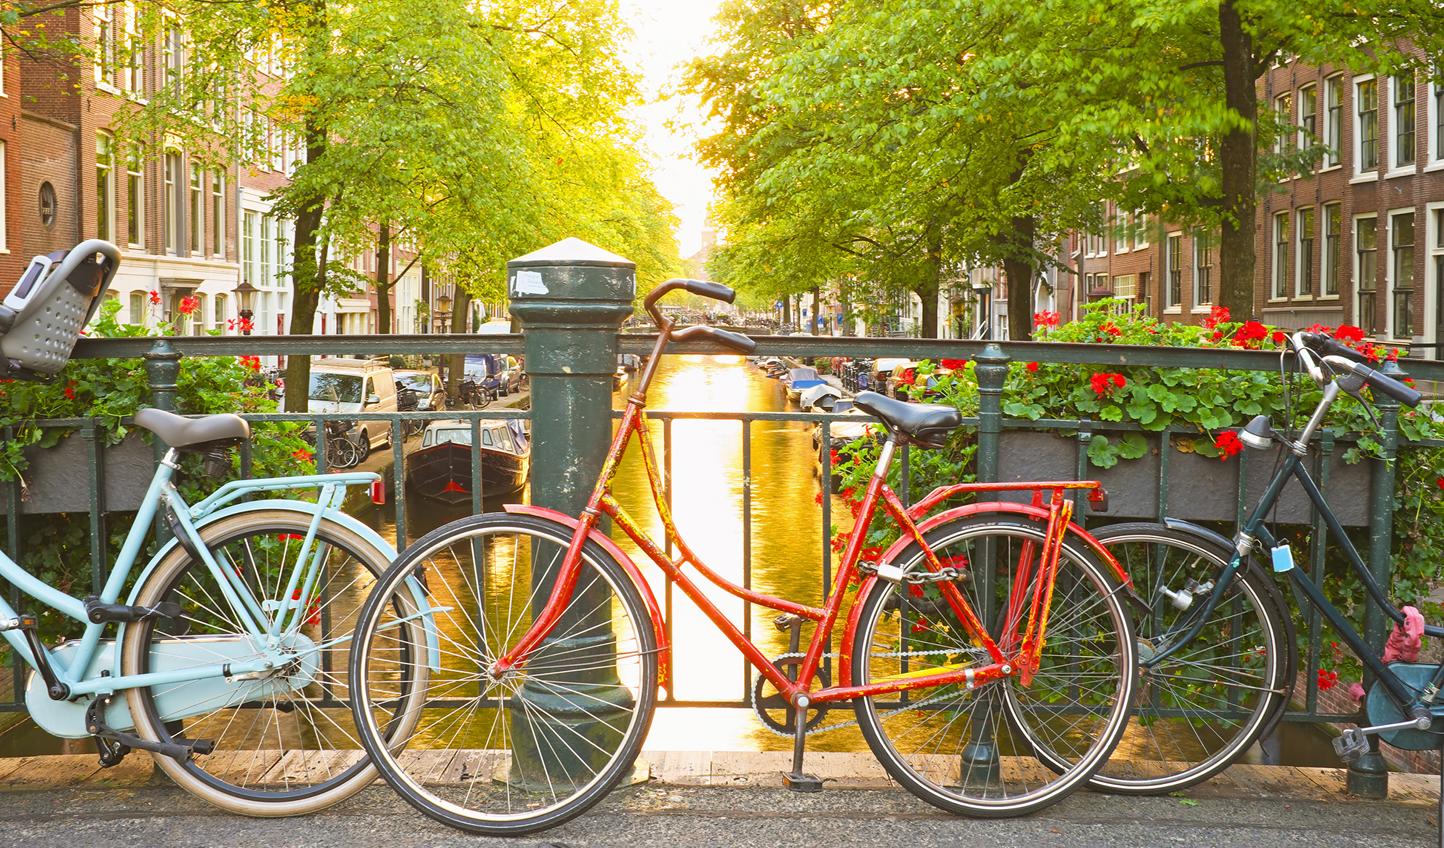 Do as the Dutch do and jump on a bike